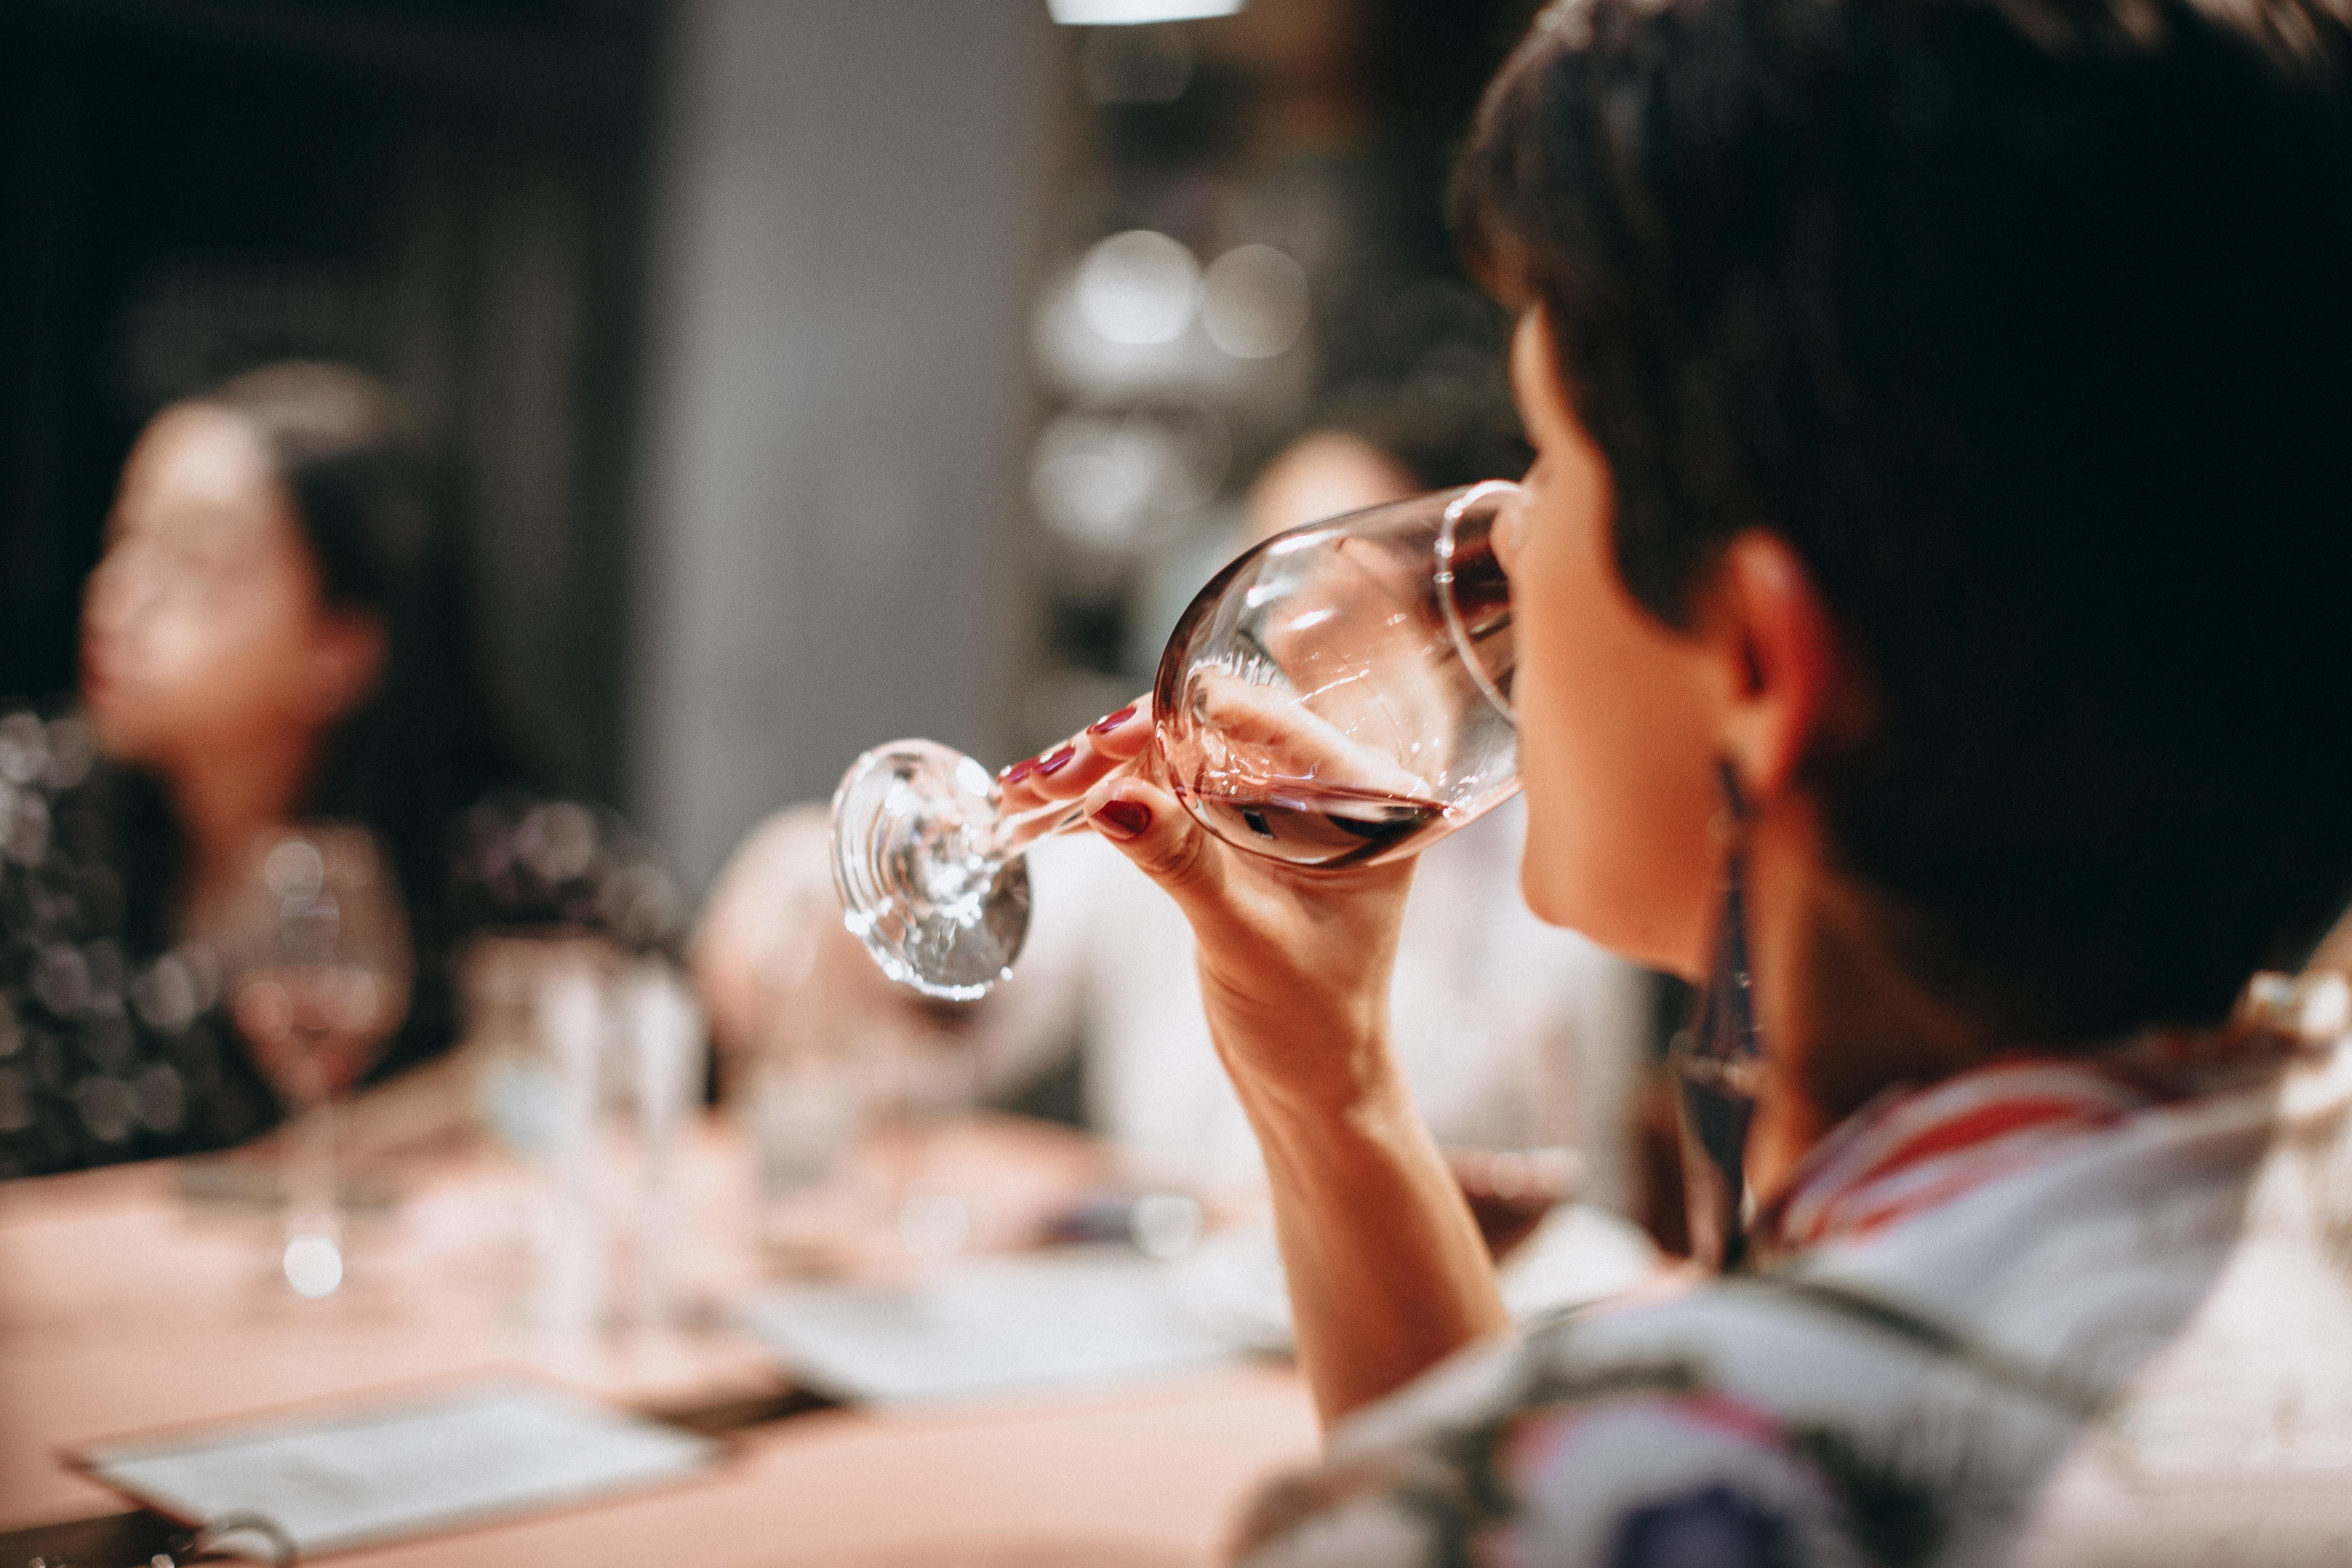 Person drinking wine photo